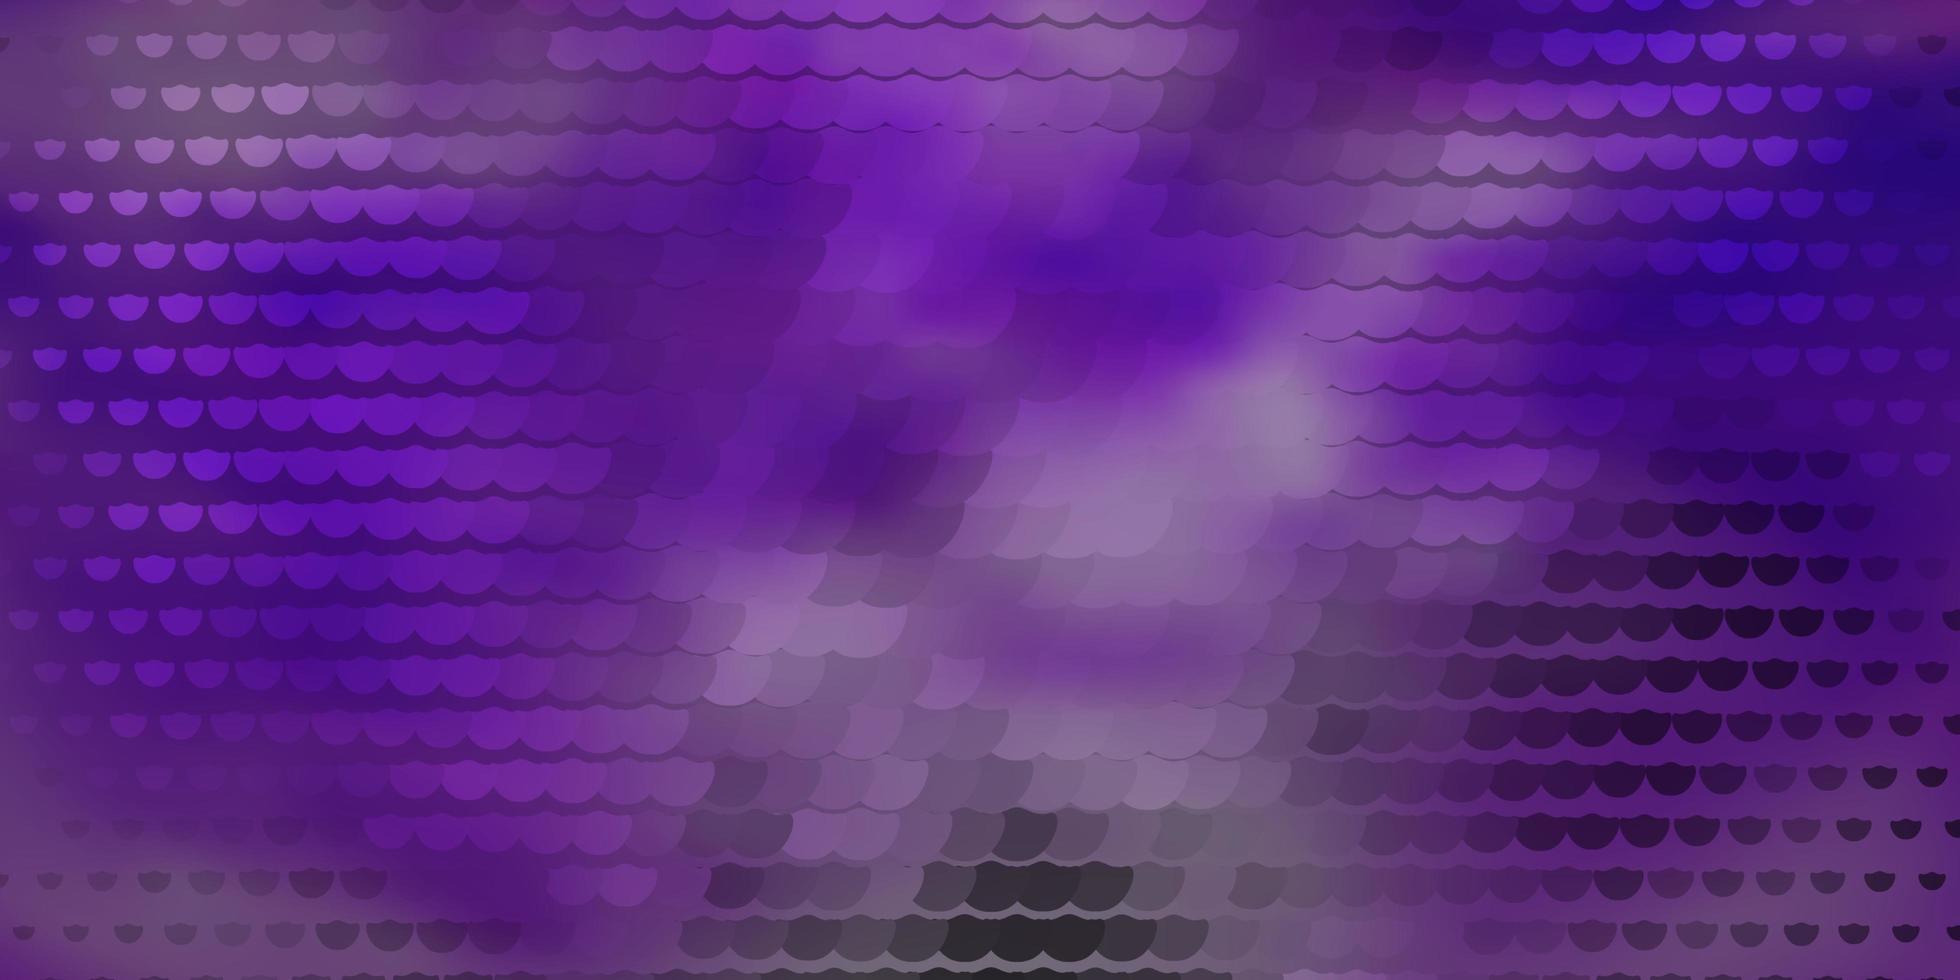 Fondo de vector púrpura oscuro con círculos.